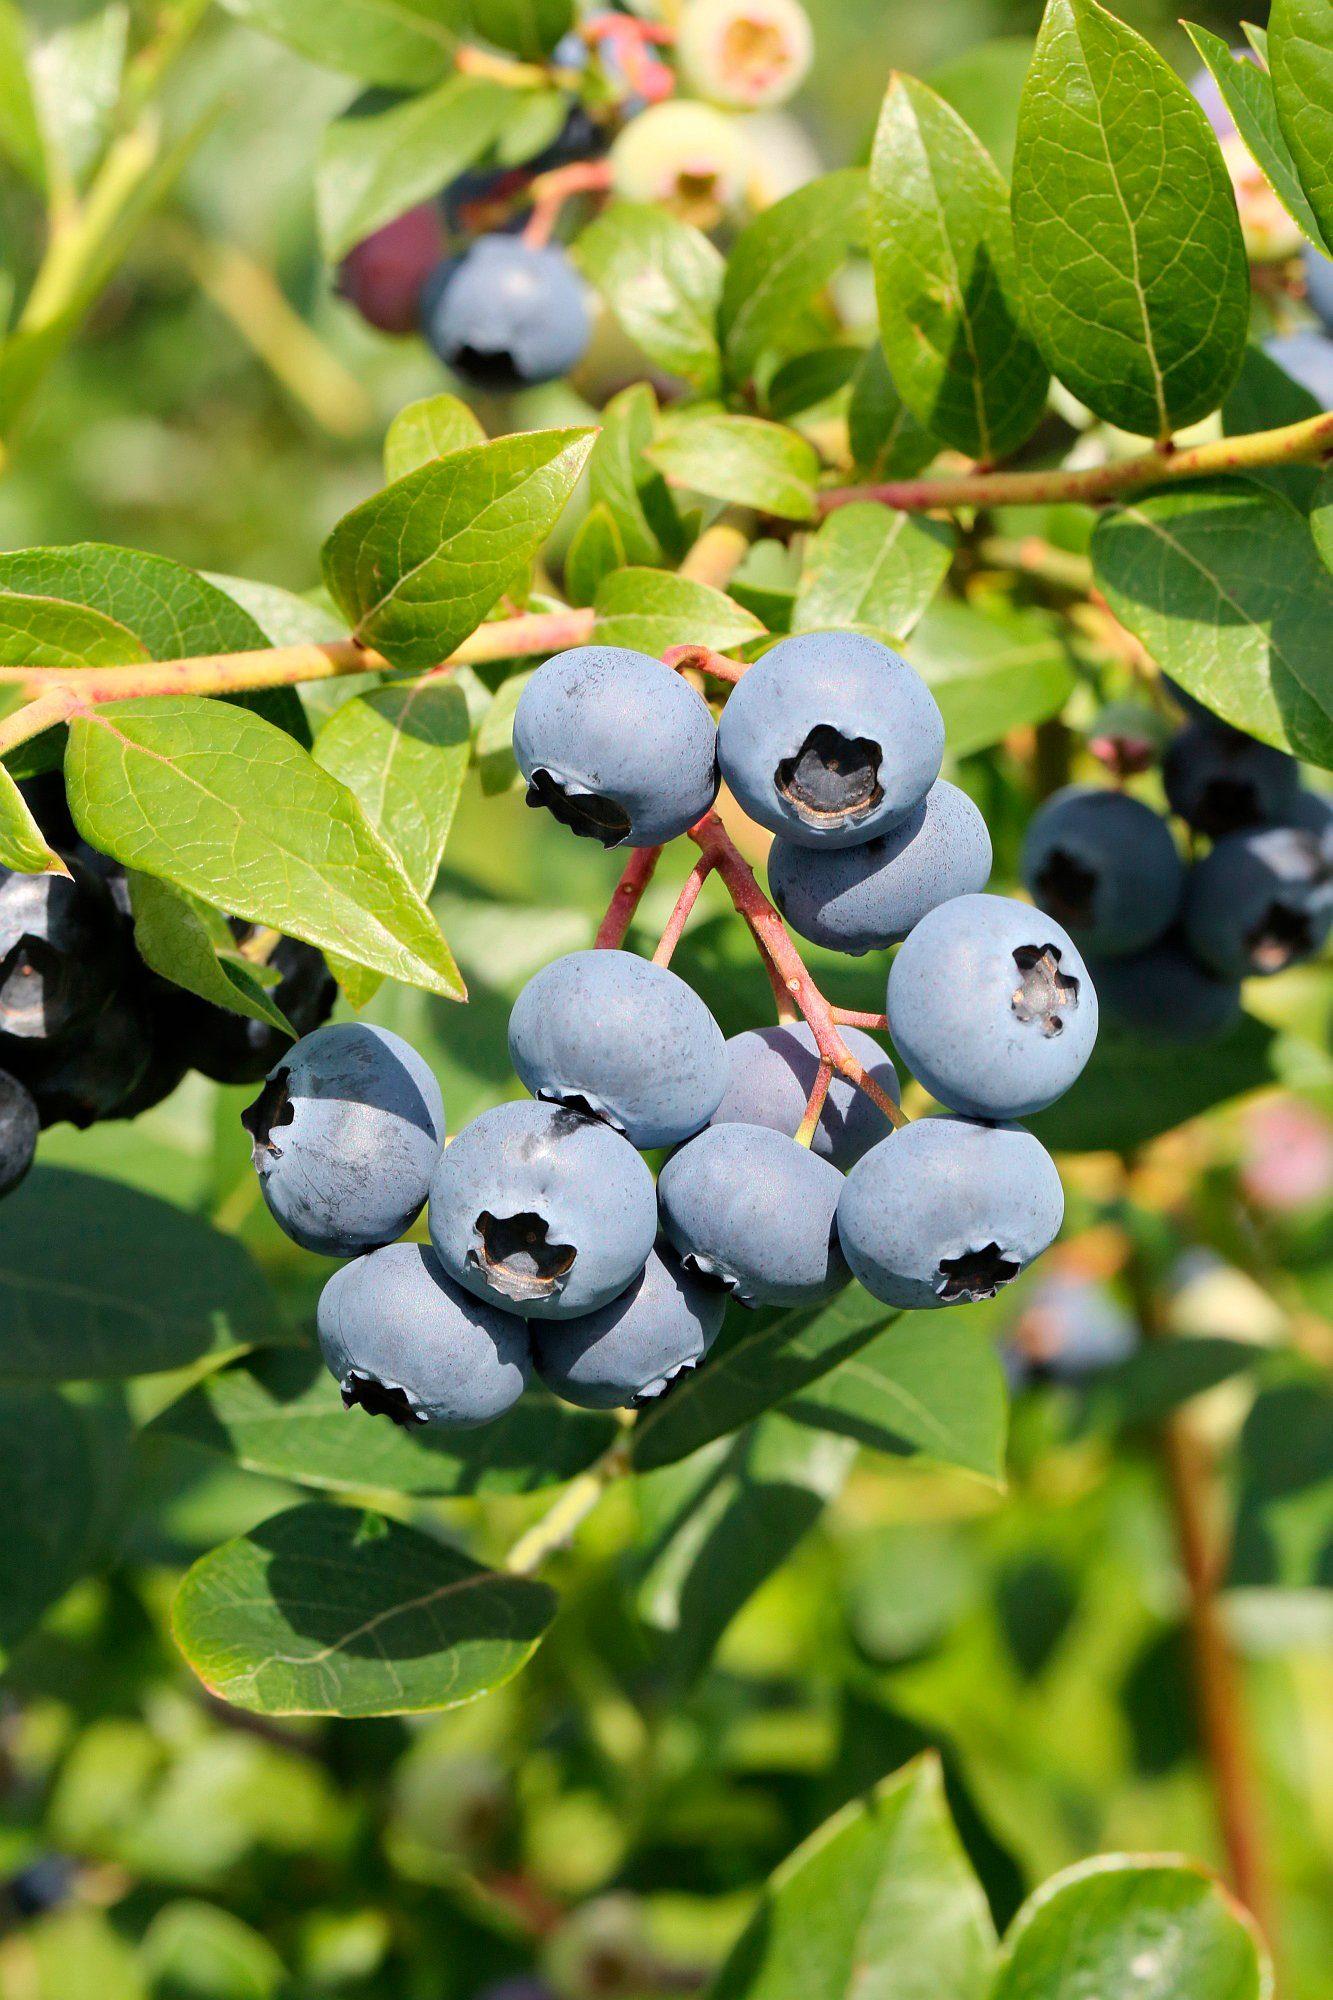 BCM Heidelbeere »Bluejay«, Höhe: 30-40 cm, 2 Pflanzen